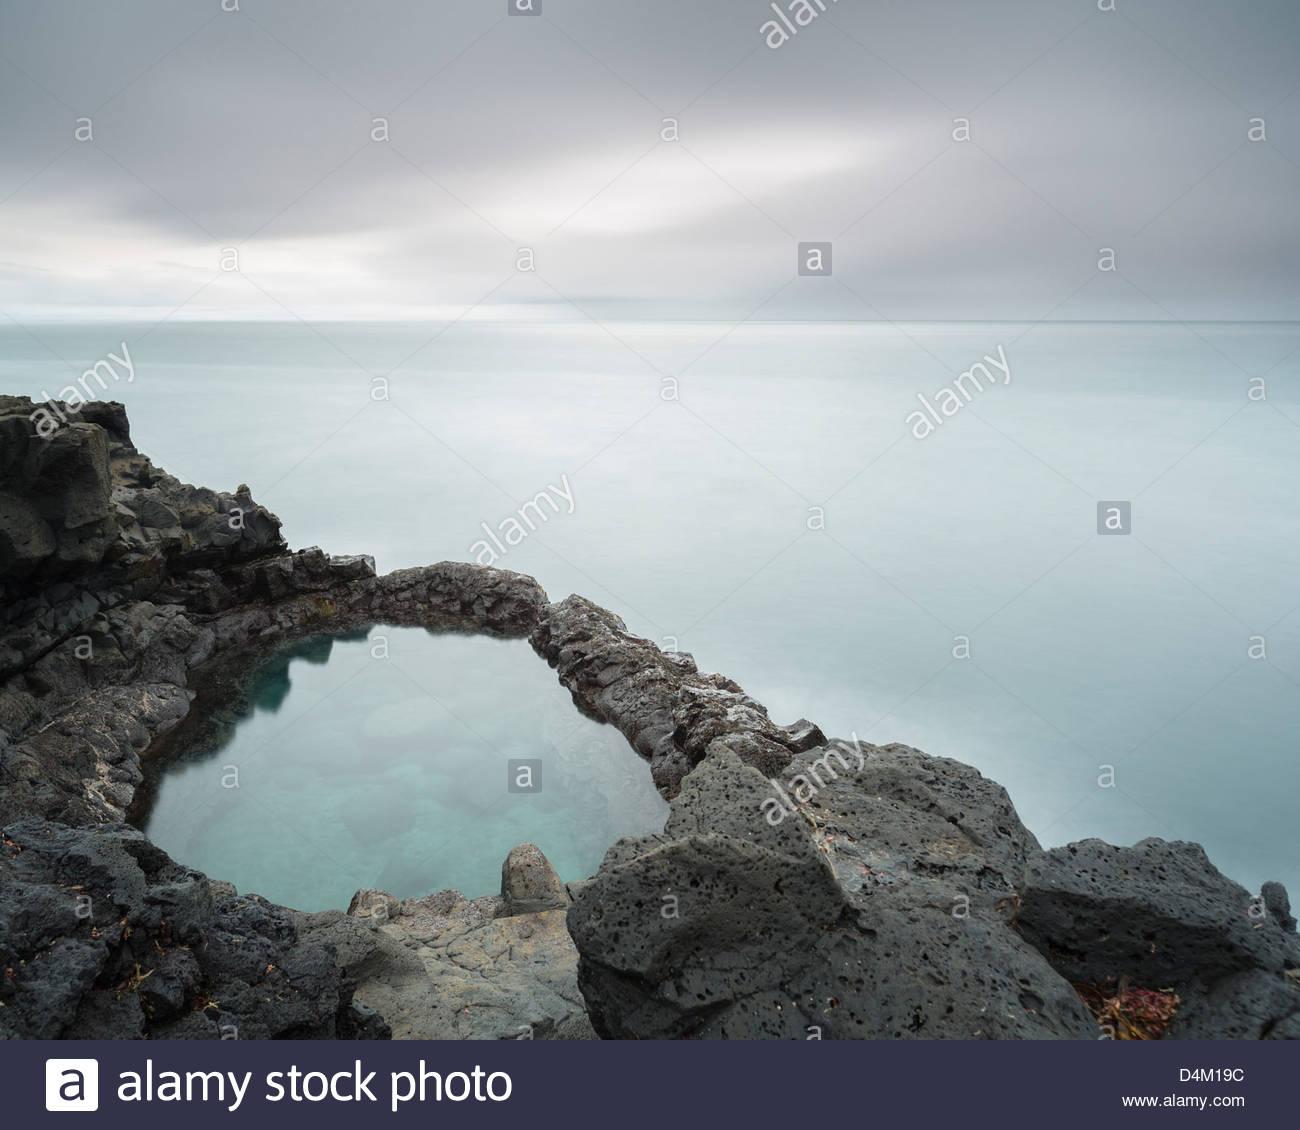 Still rock pool in ocean - Stock Image